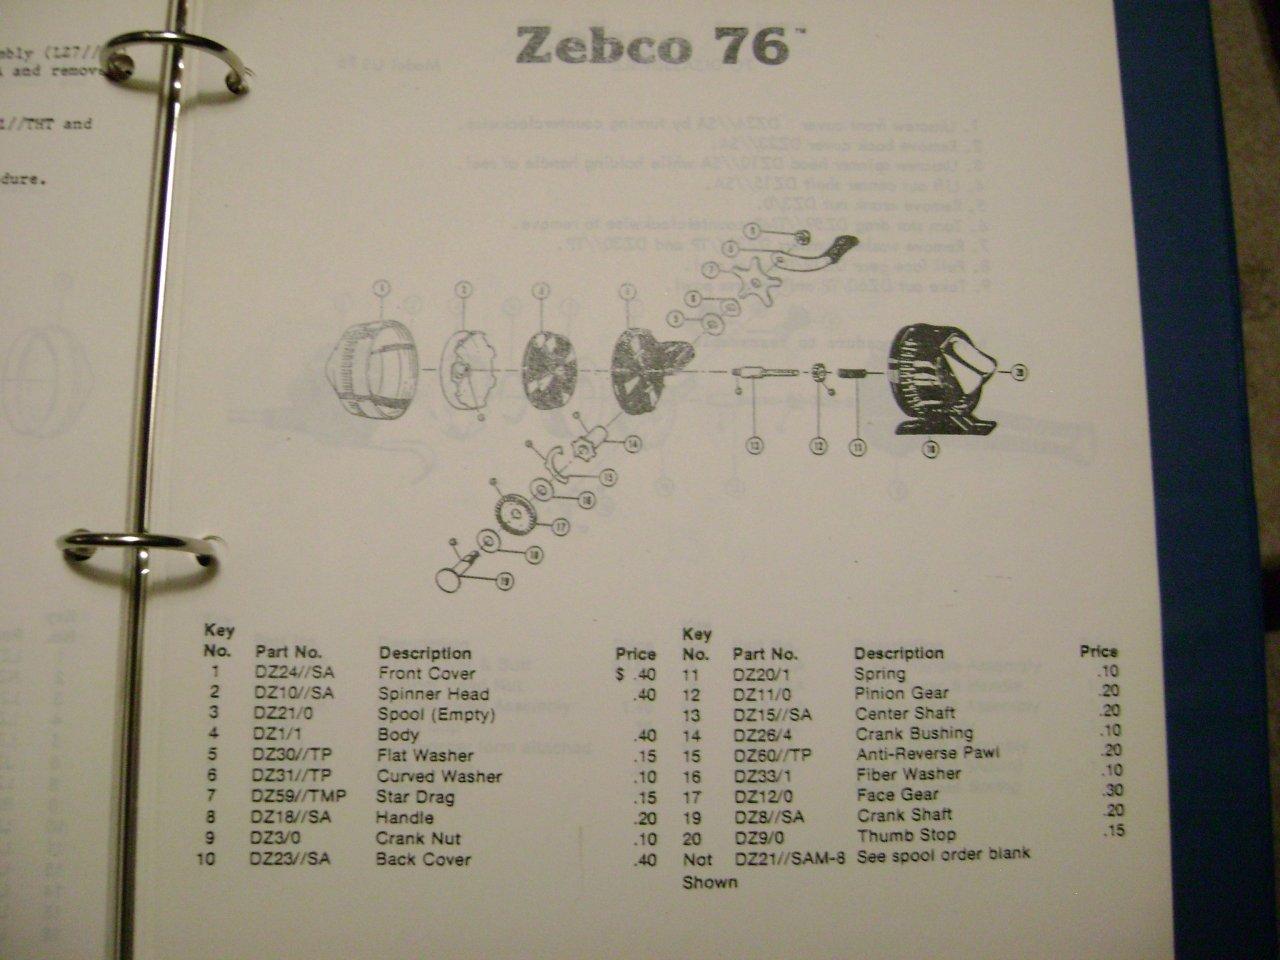 zebco org \u2013 the definitive \u0026 authoritative source for quantum reel disassembly samsung rl39wbms service manual repair